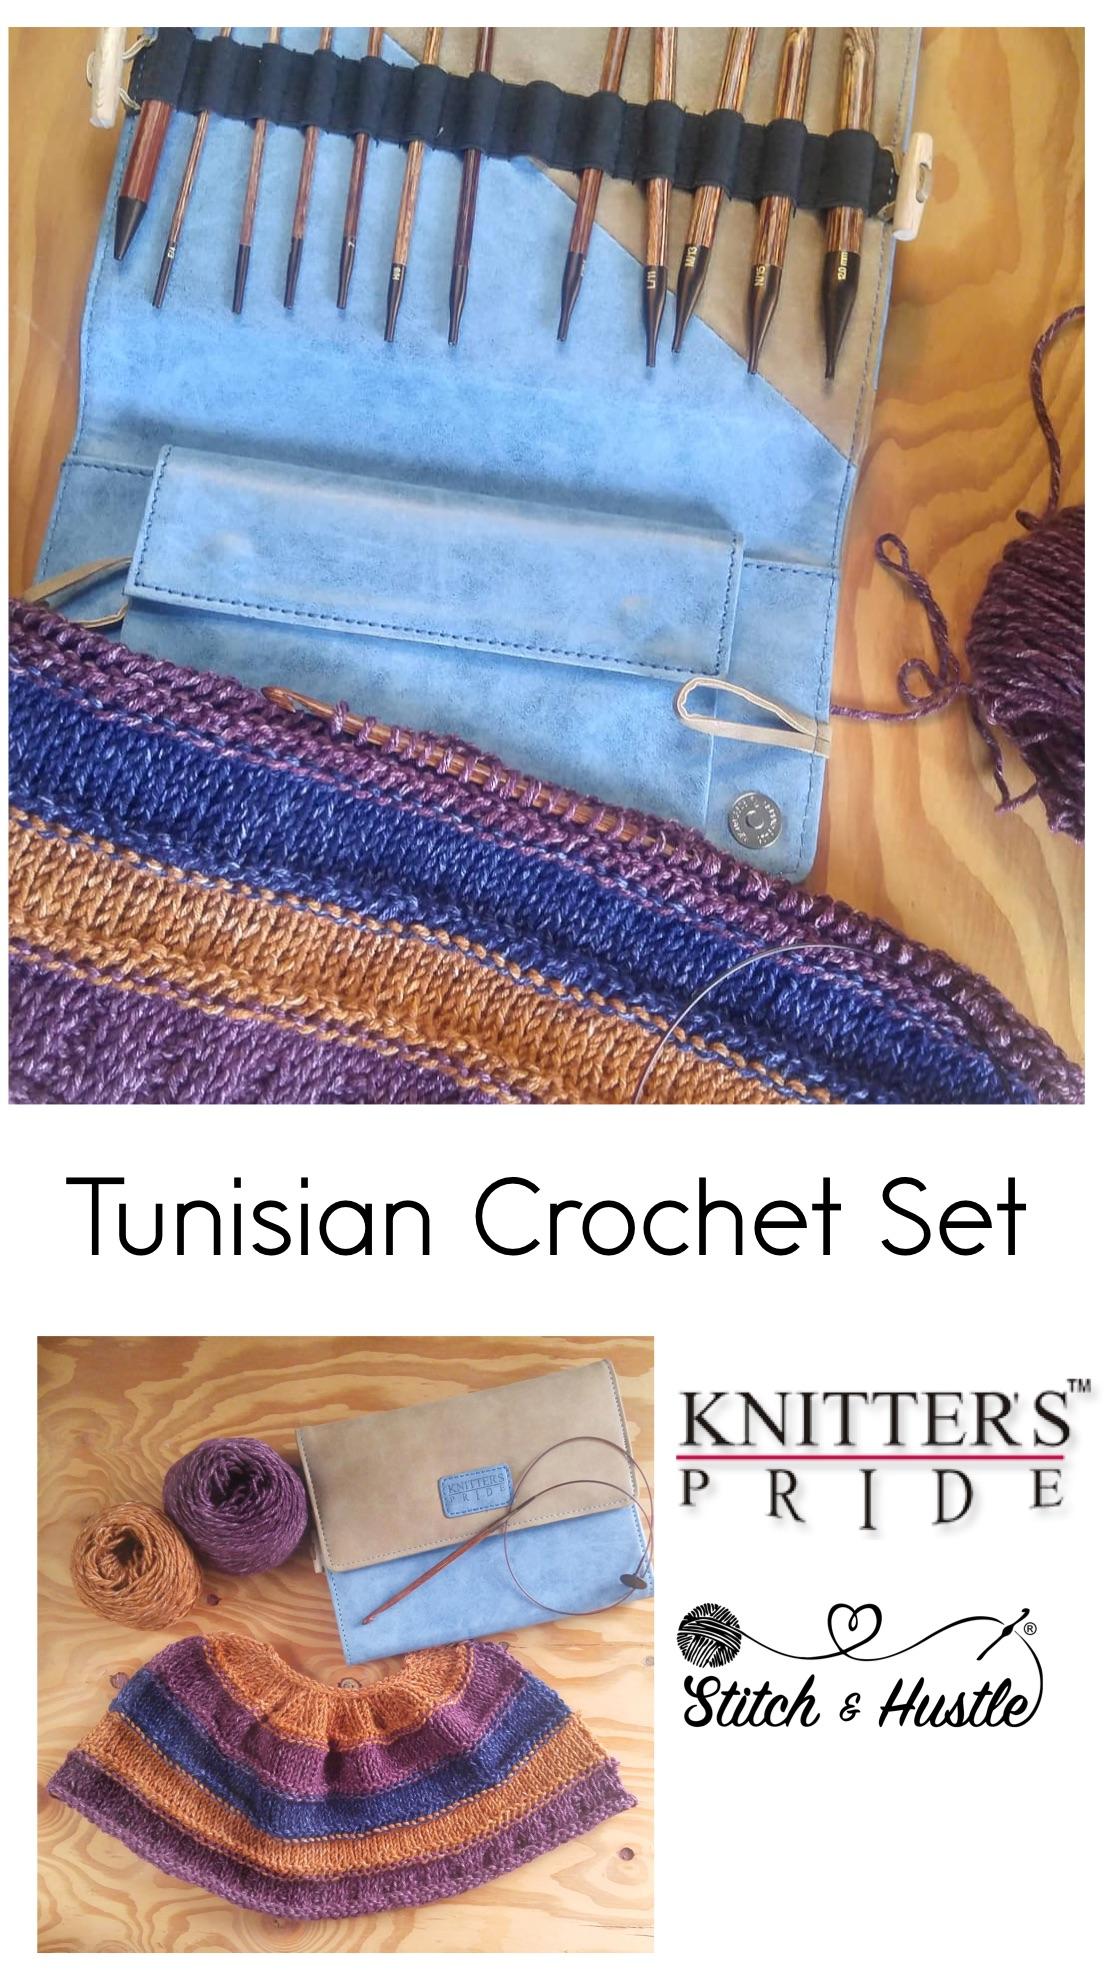 KnittersPride_TunisianCrochetHook_Review4.jpg